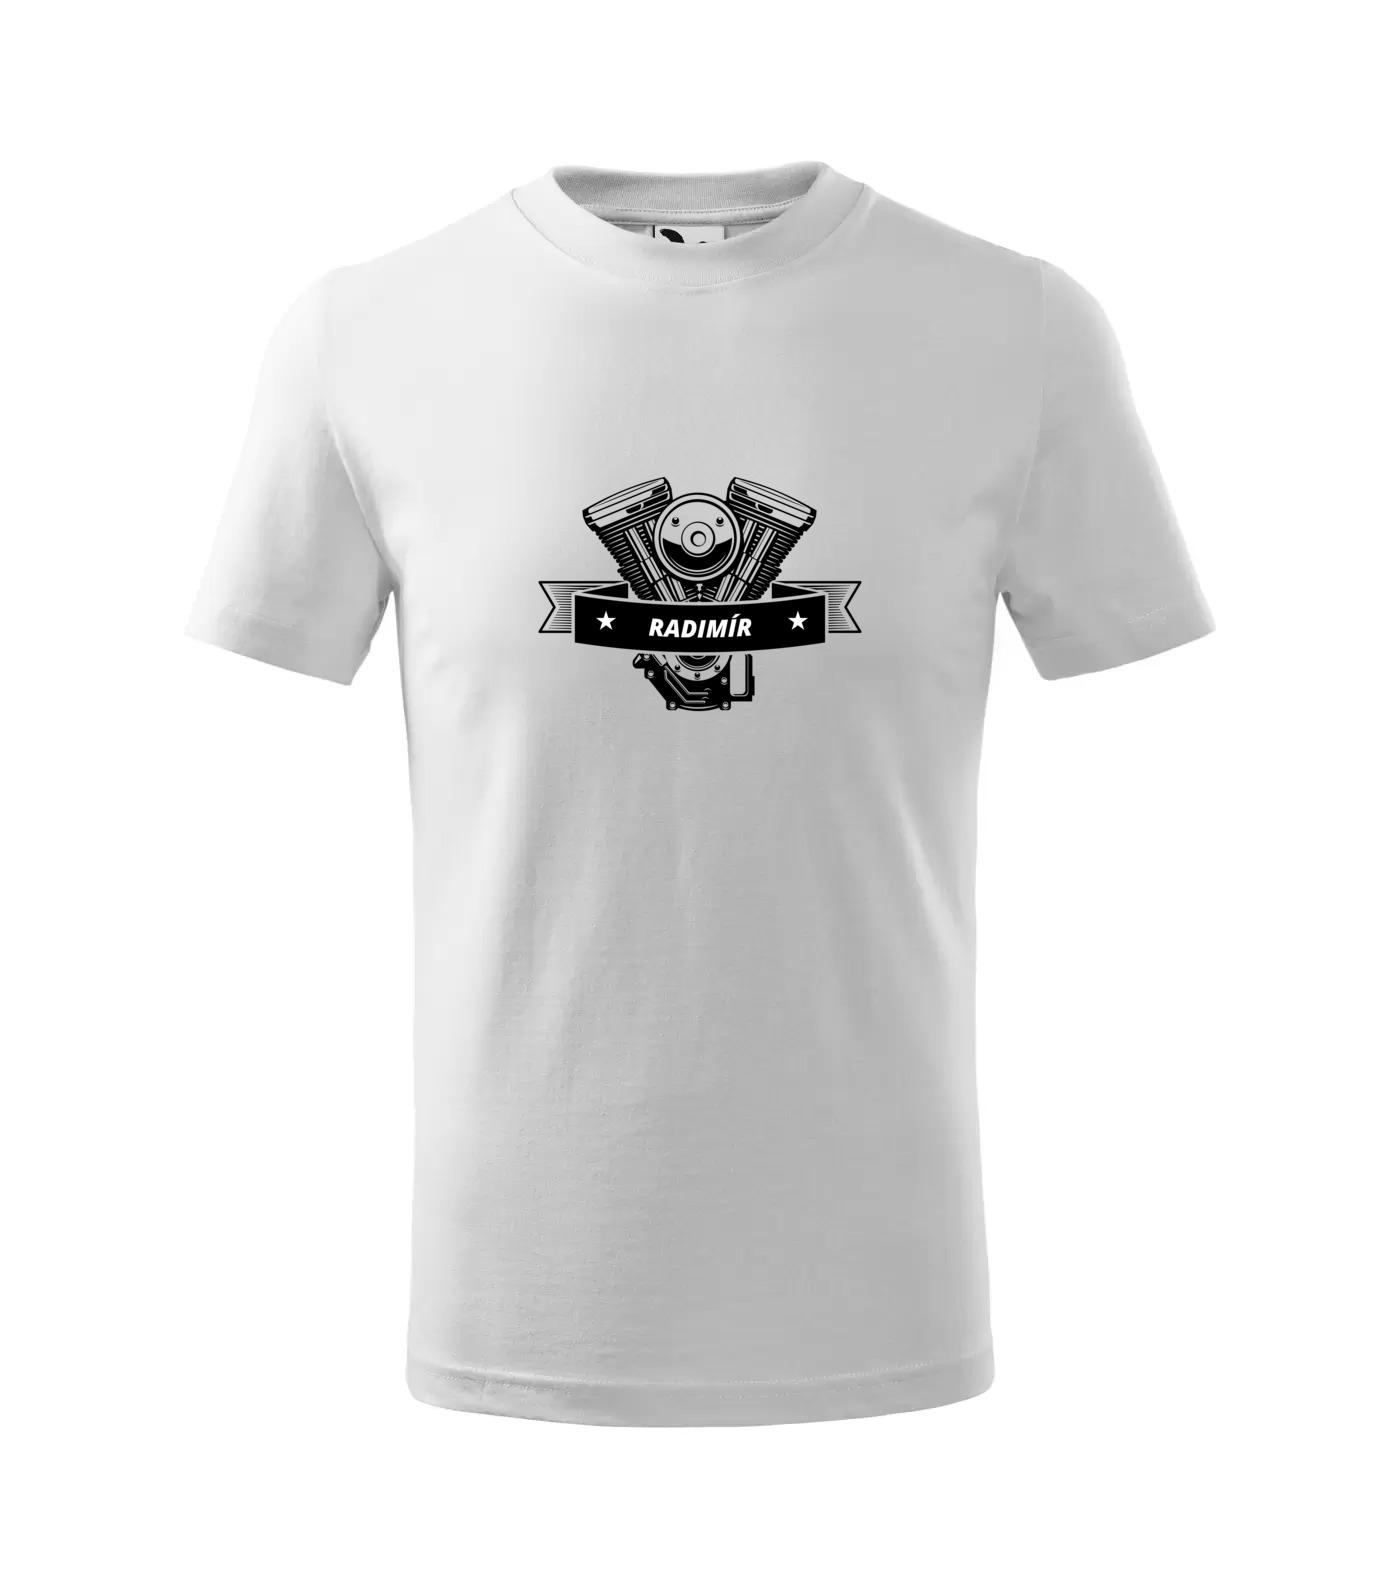 Tričko Motorkář Radimír